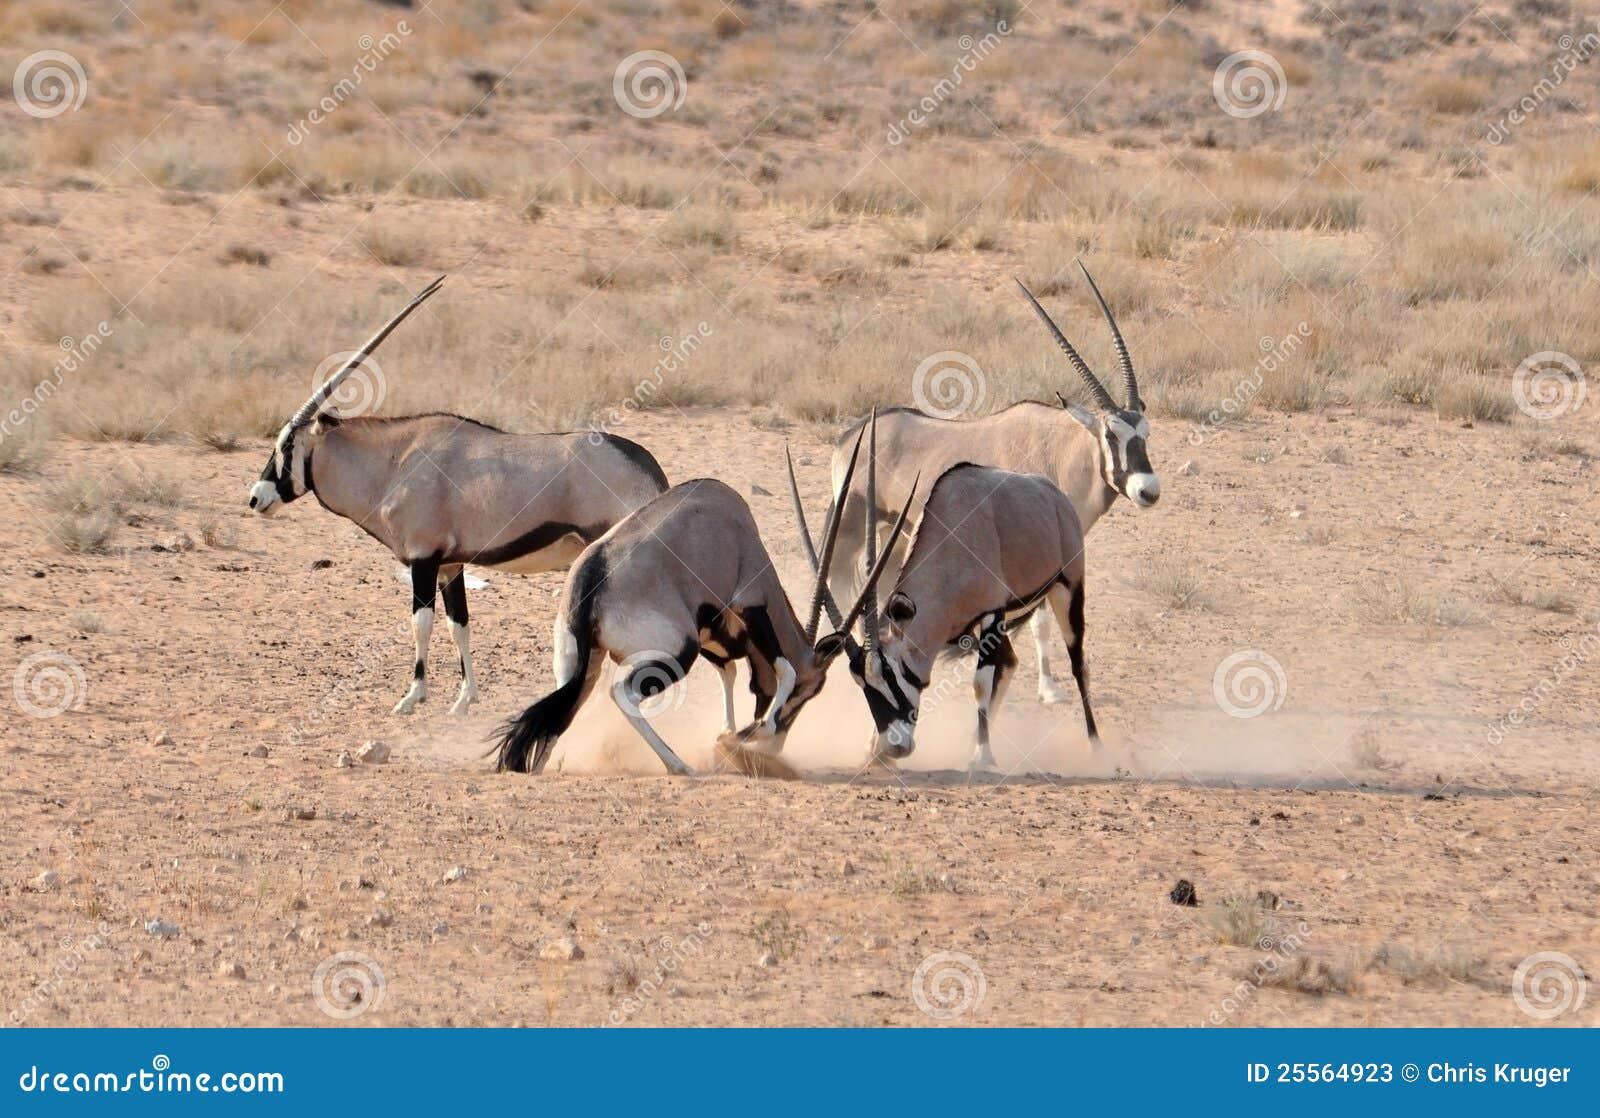 Gemsbok (Oryx) Antelope Fight Stock Image - Image: 25564923